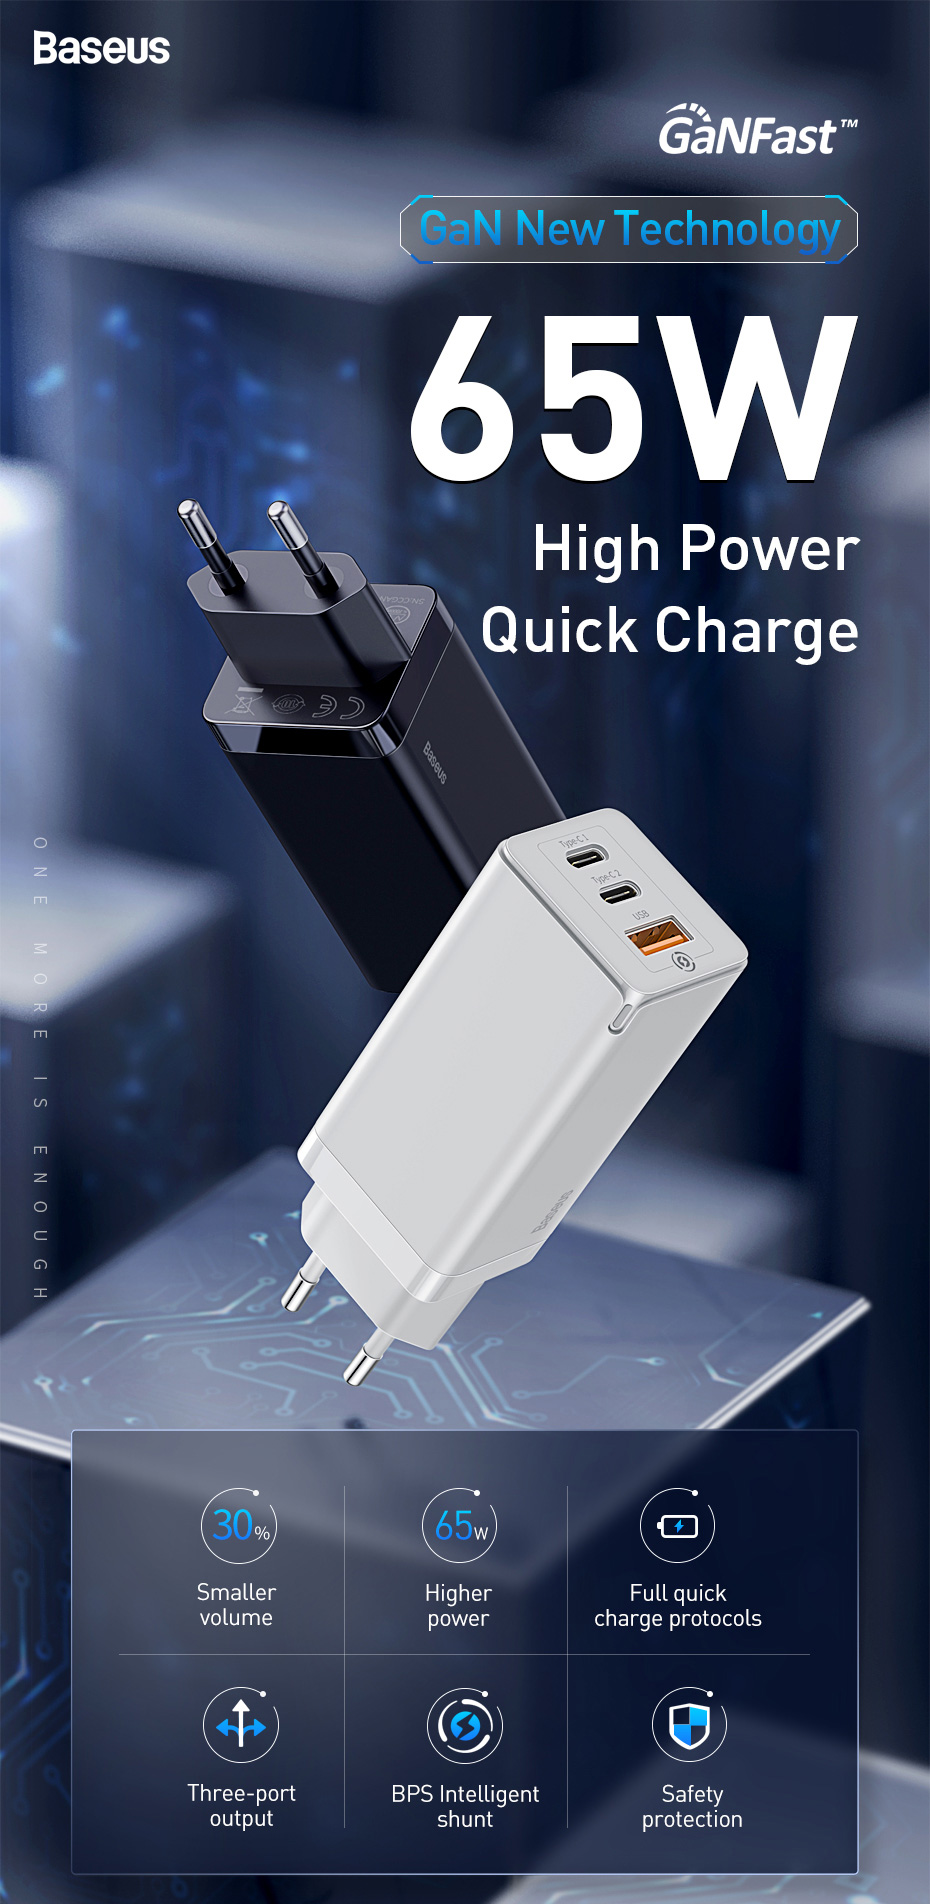 Baseus GaN 65W USB Quick Mobile Phone Charger 6